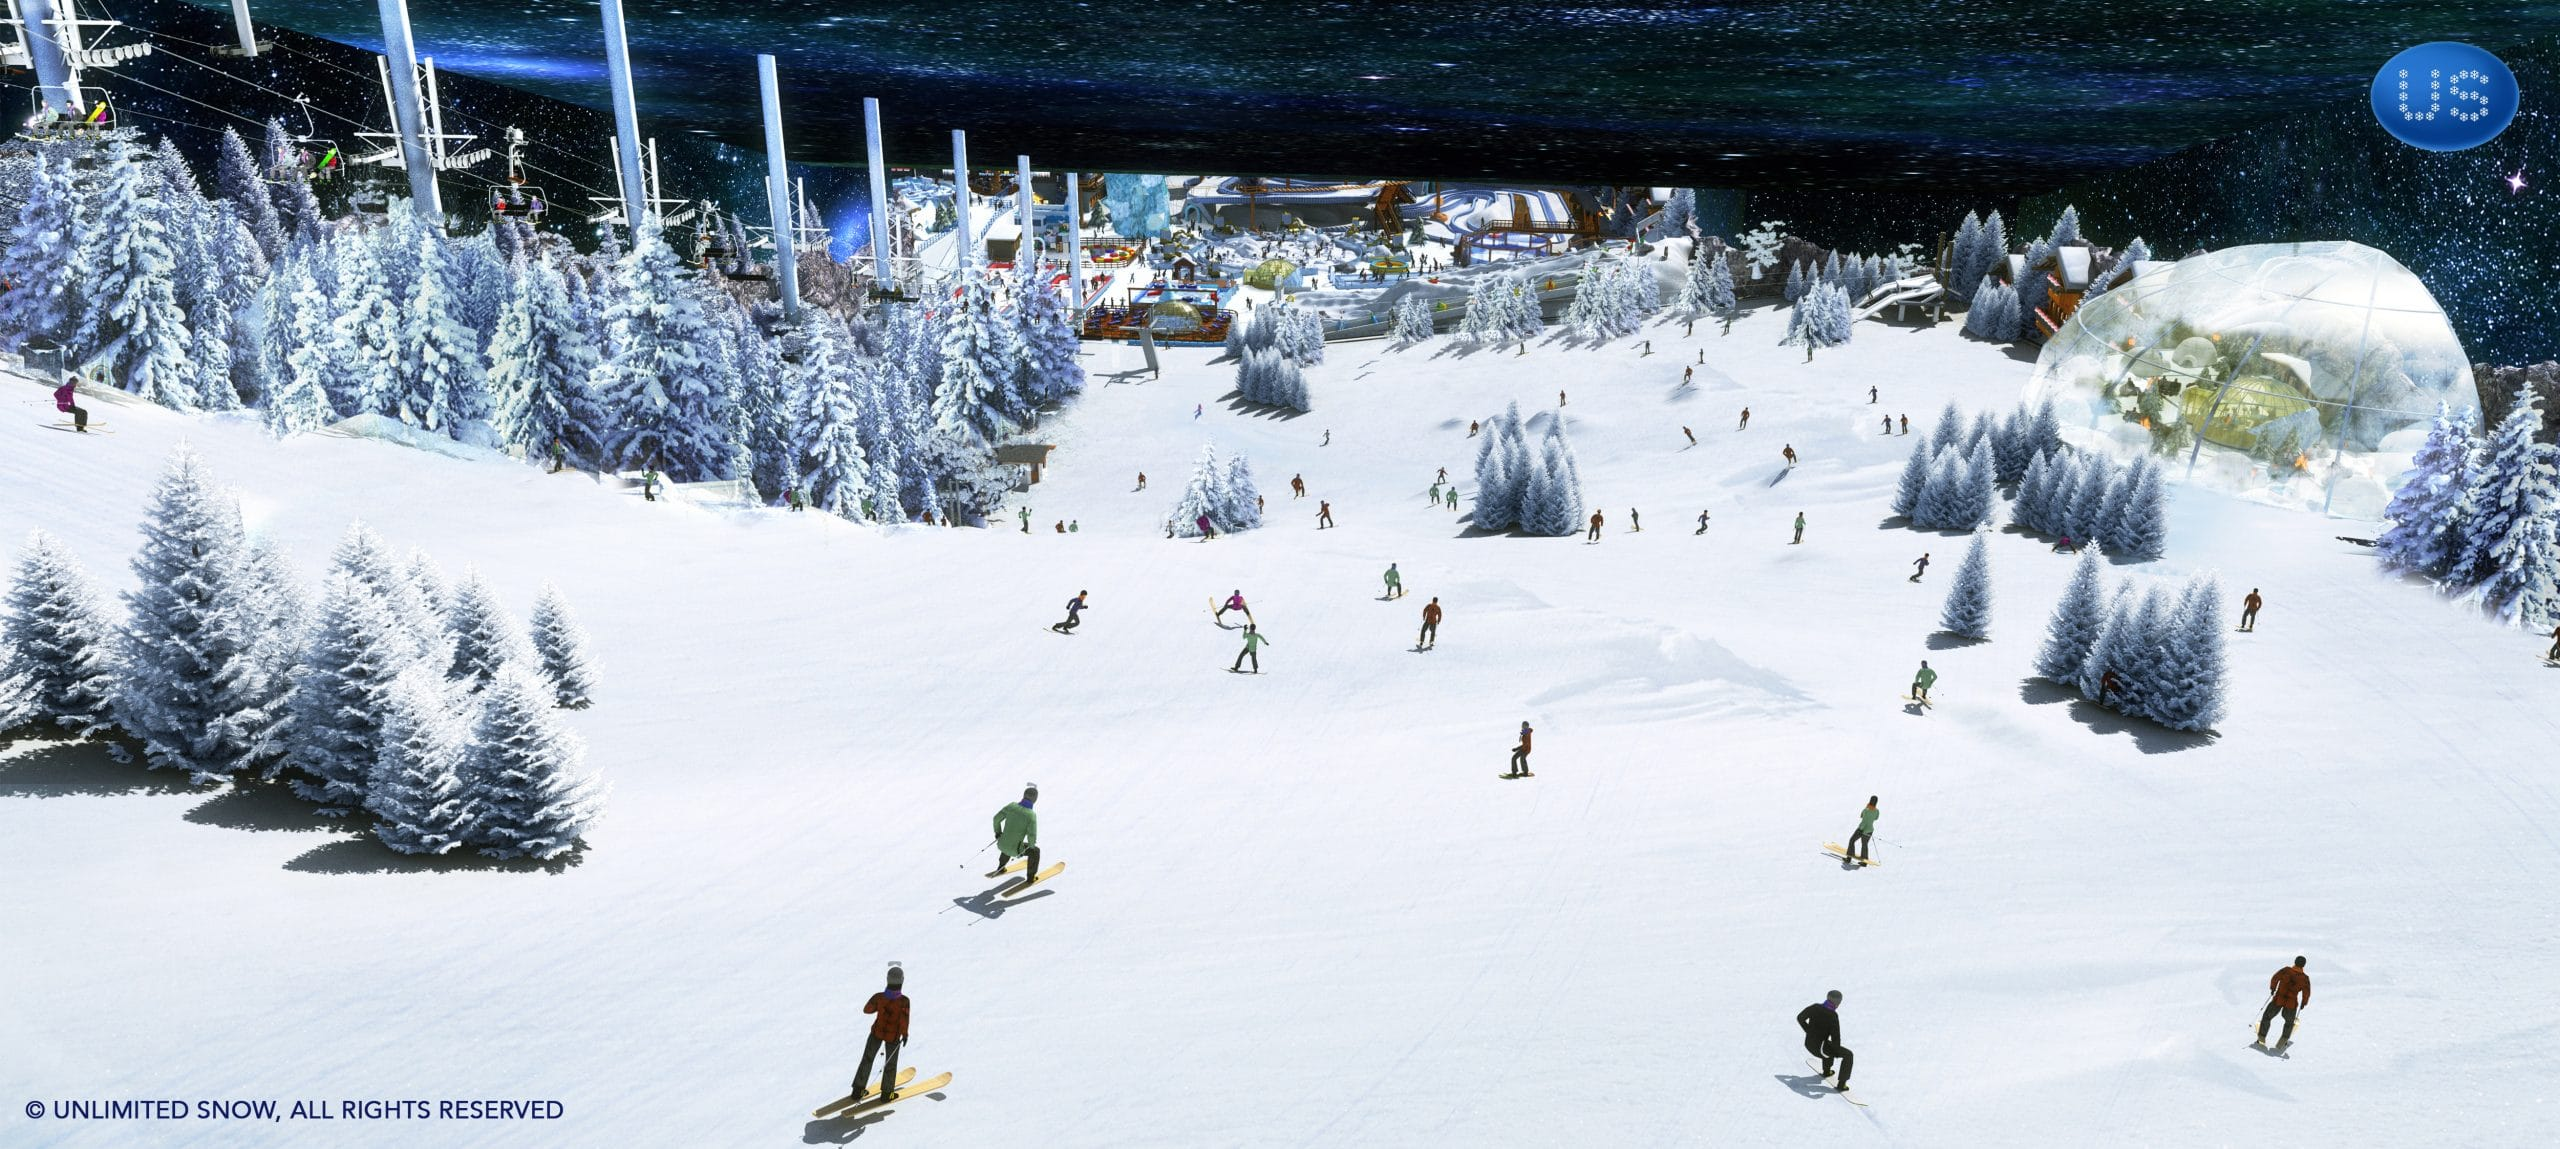 https://www.giebrostechnics.nl/wp-content/uploads/2020/07/Unlimited-Snow_Photo_4-scaled.jpg